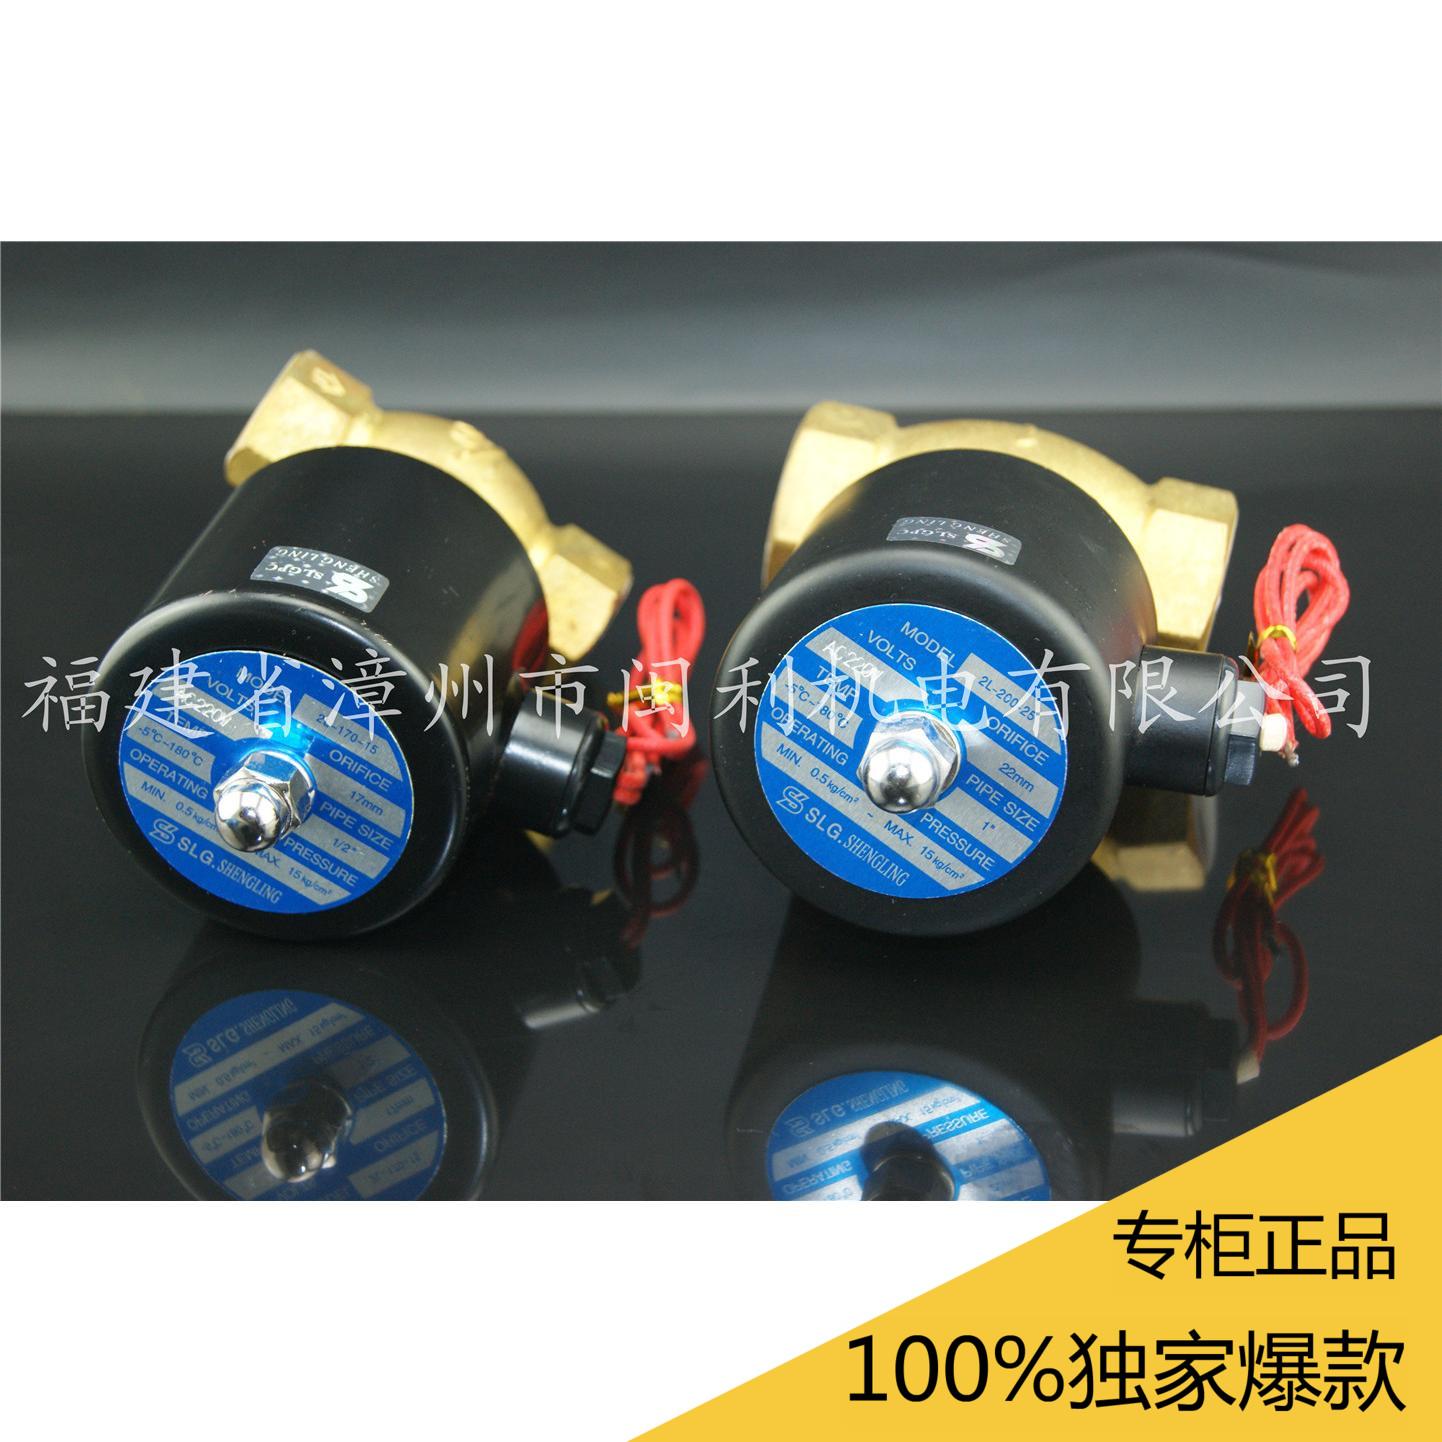 DN252L200-251 inch normally closed steam solenoid valve 2L-25 solenoid valve